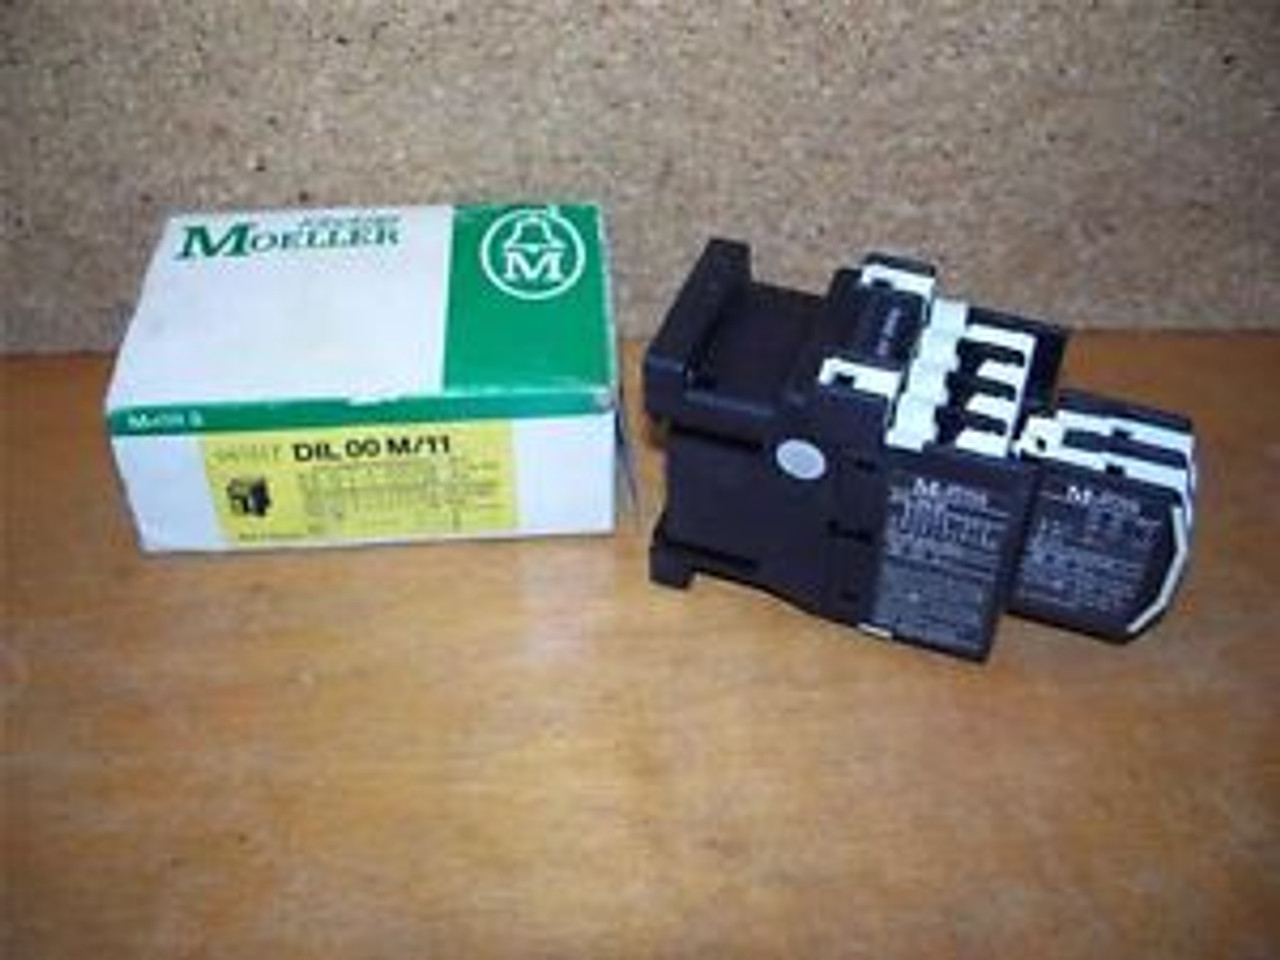 DIL 00 M // DIL00M Klockner Moeller Relay 24VAC Coil 20A Used